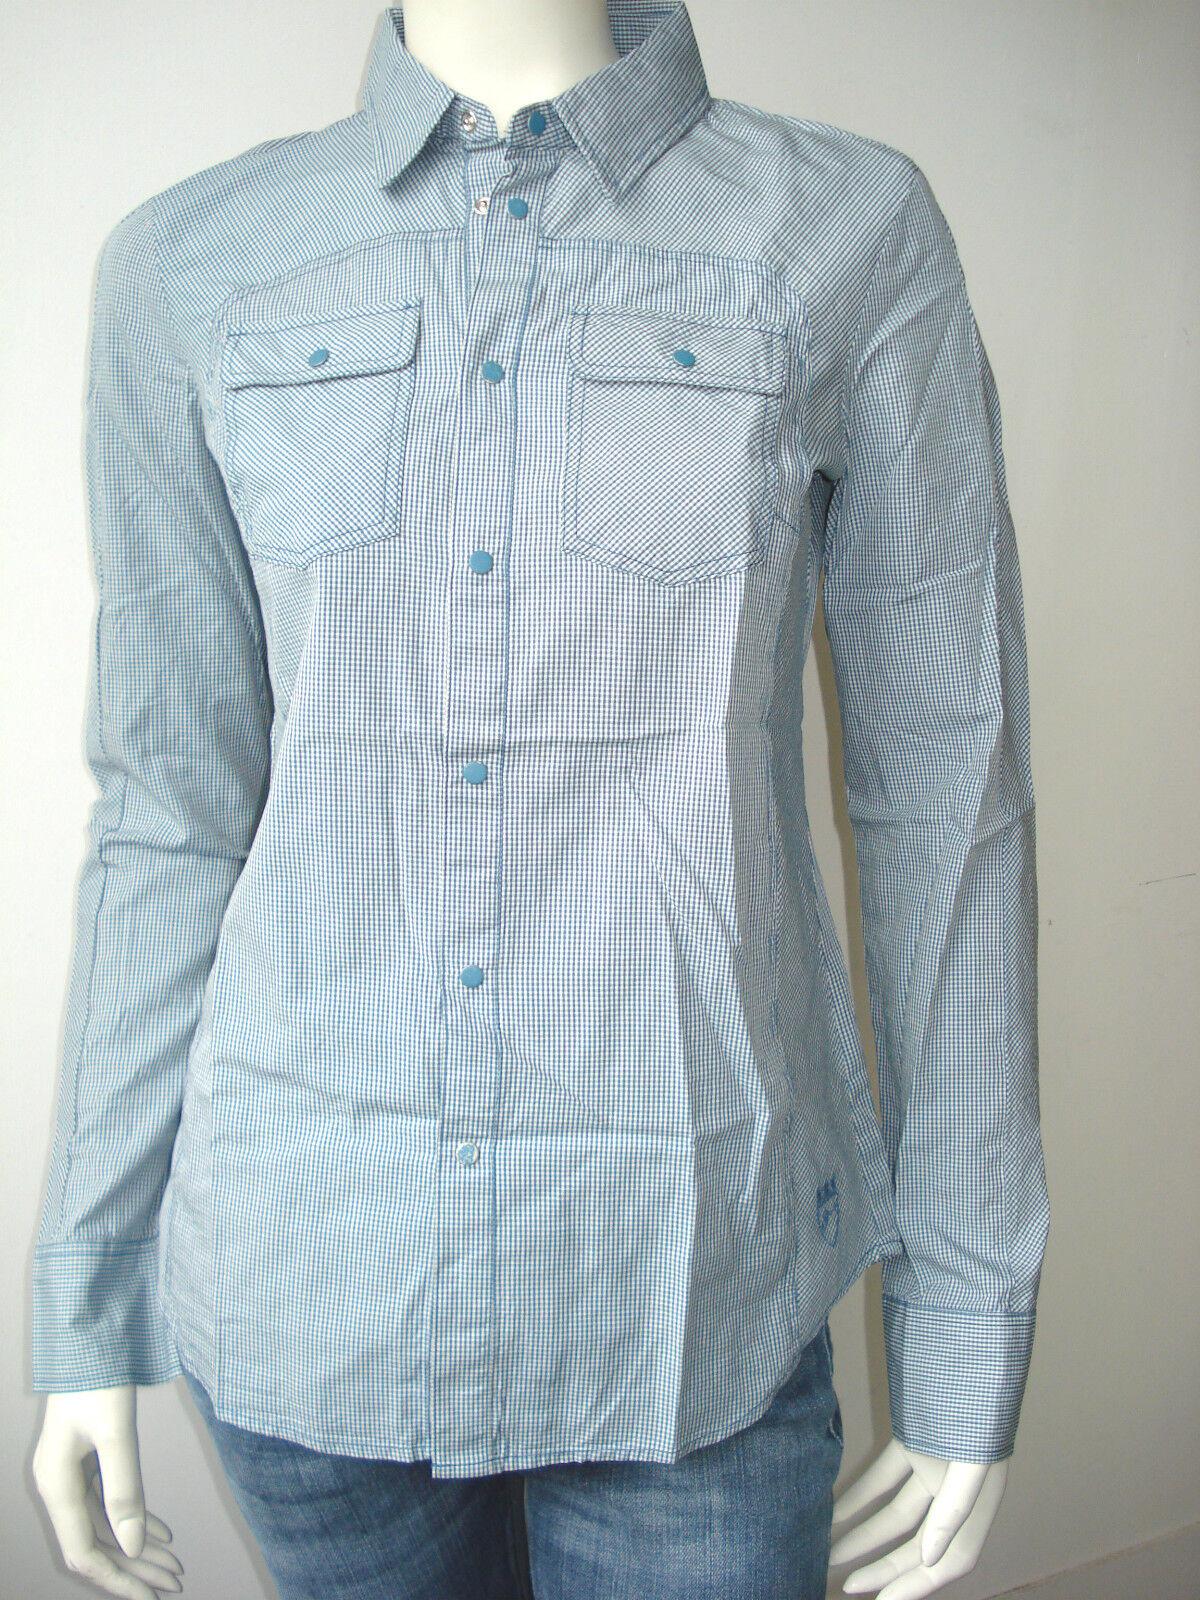 Diesel Damen Langarm Shirt Blause Overhemd Clodi Neu Schön